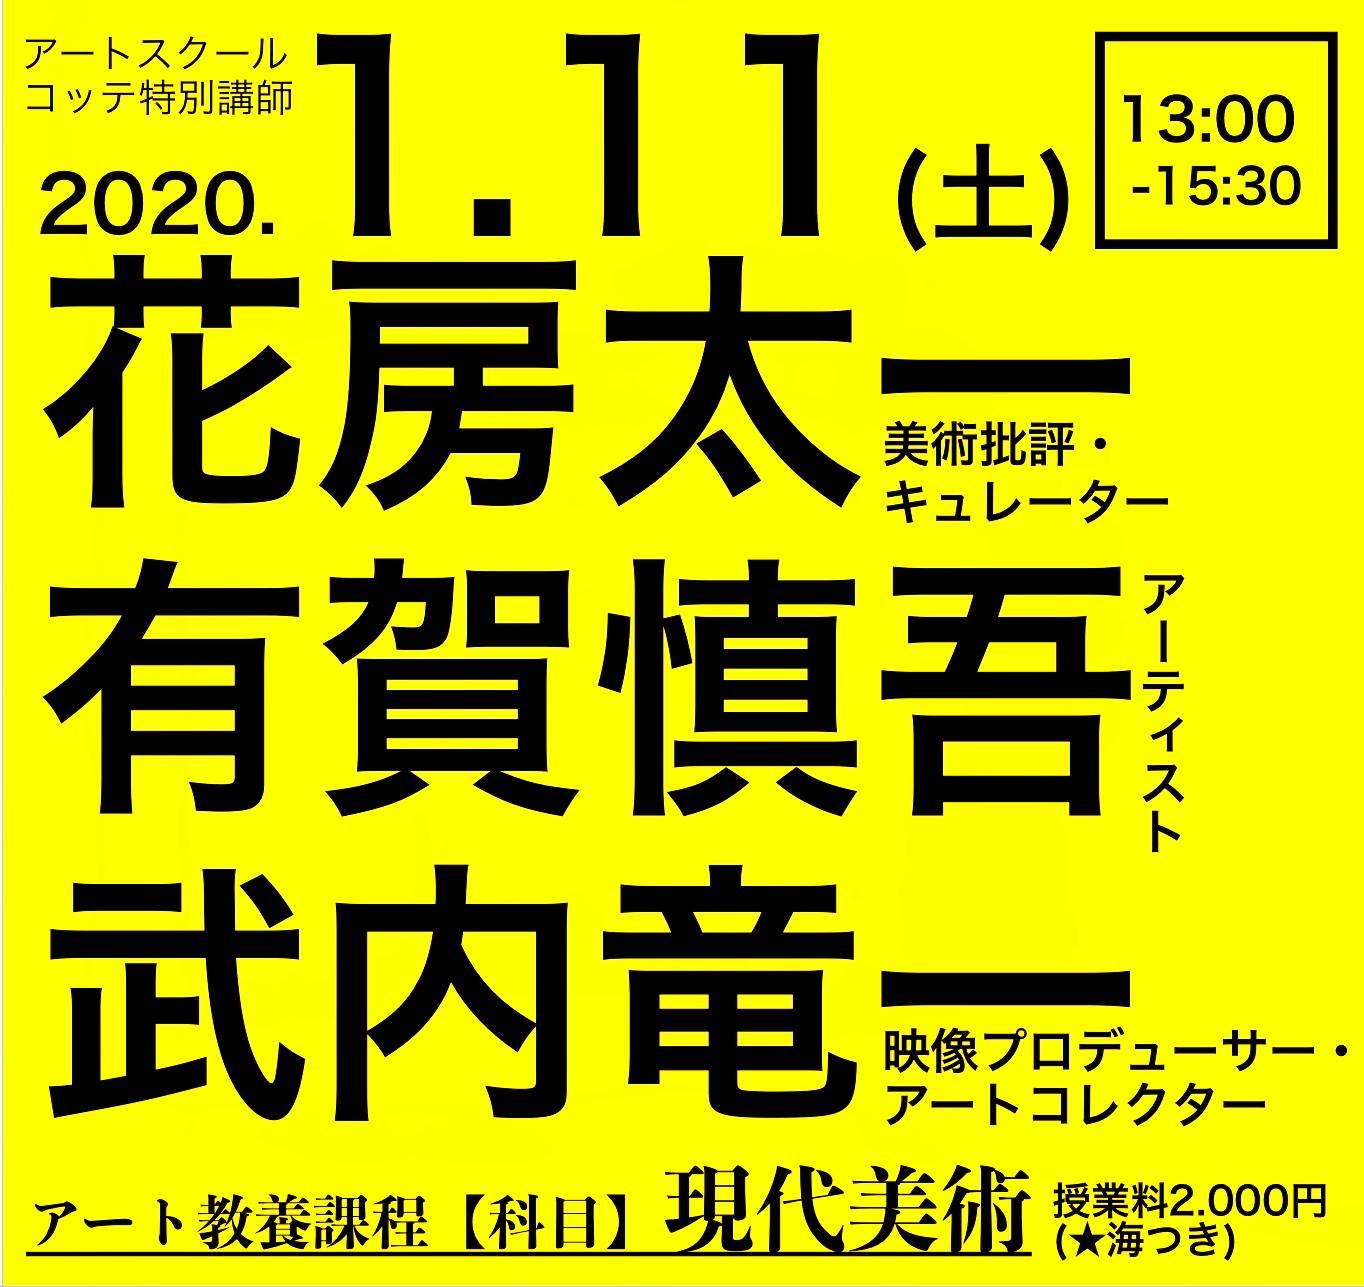 【kotte公開授業】花房太一+有賀慎吾+武内竜一「現代美術について」